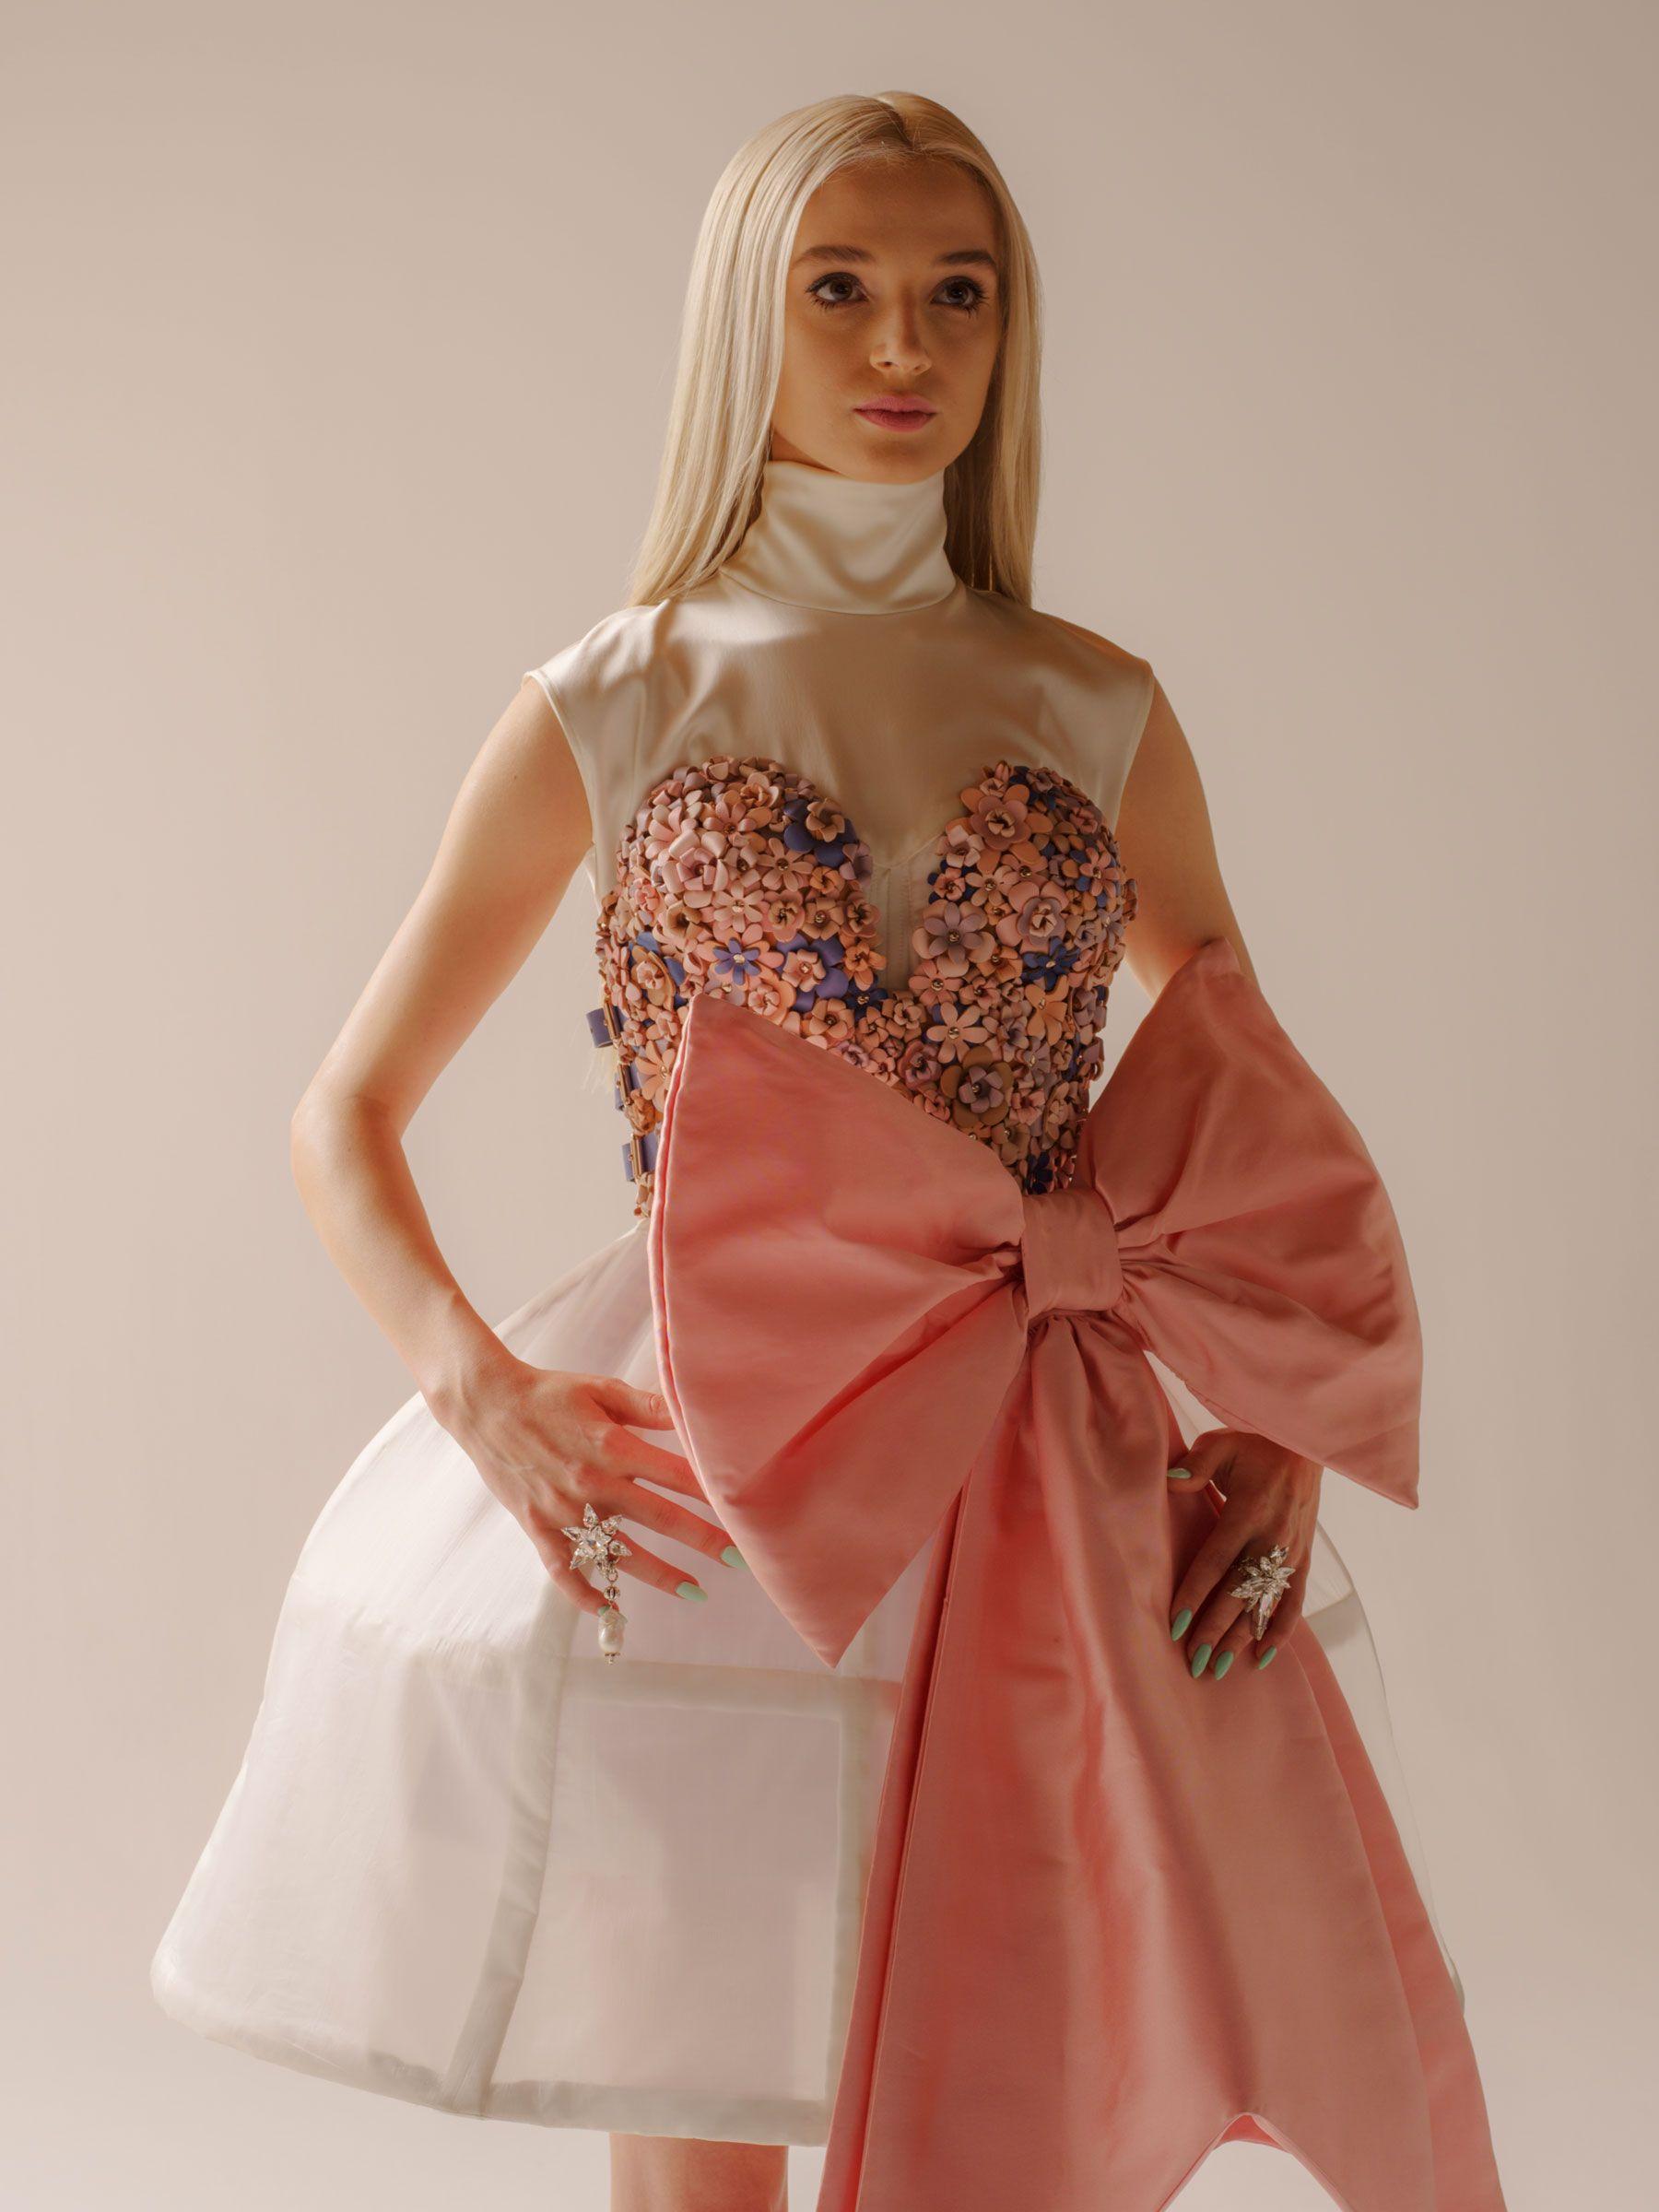 , Welcome to Poppy's World, My Pop Star Kda Blog, My Pop Star Kda Blog